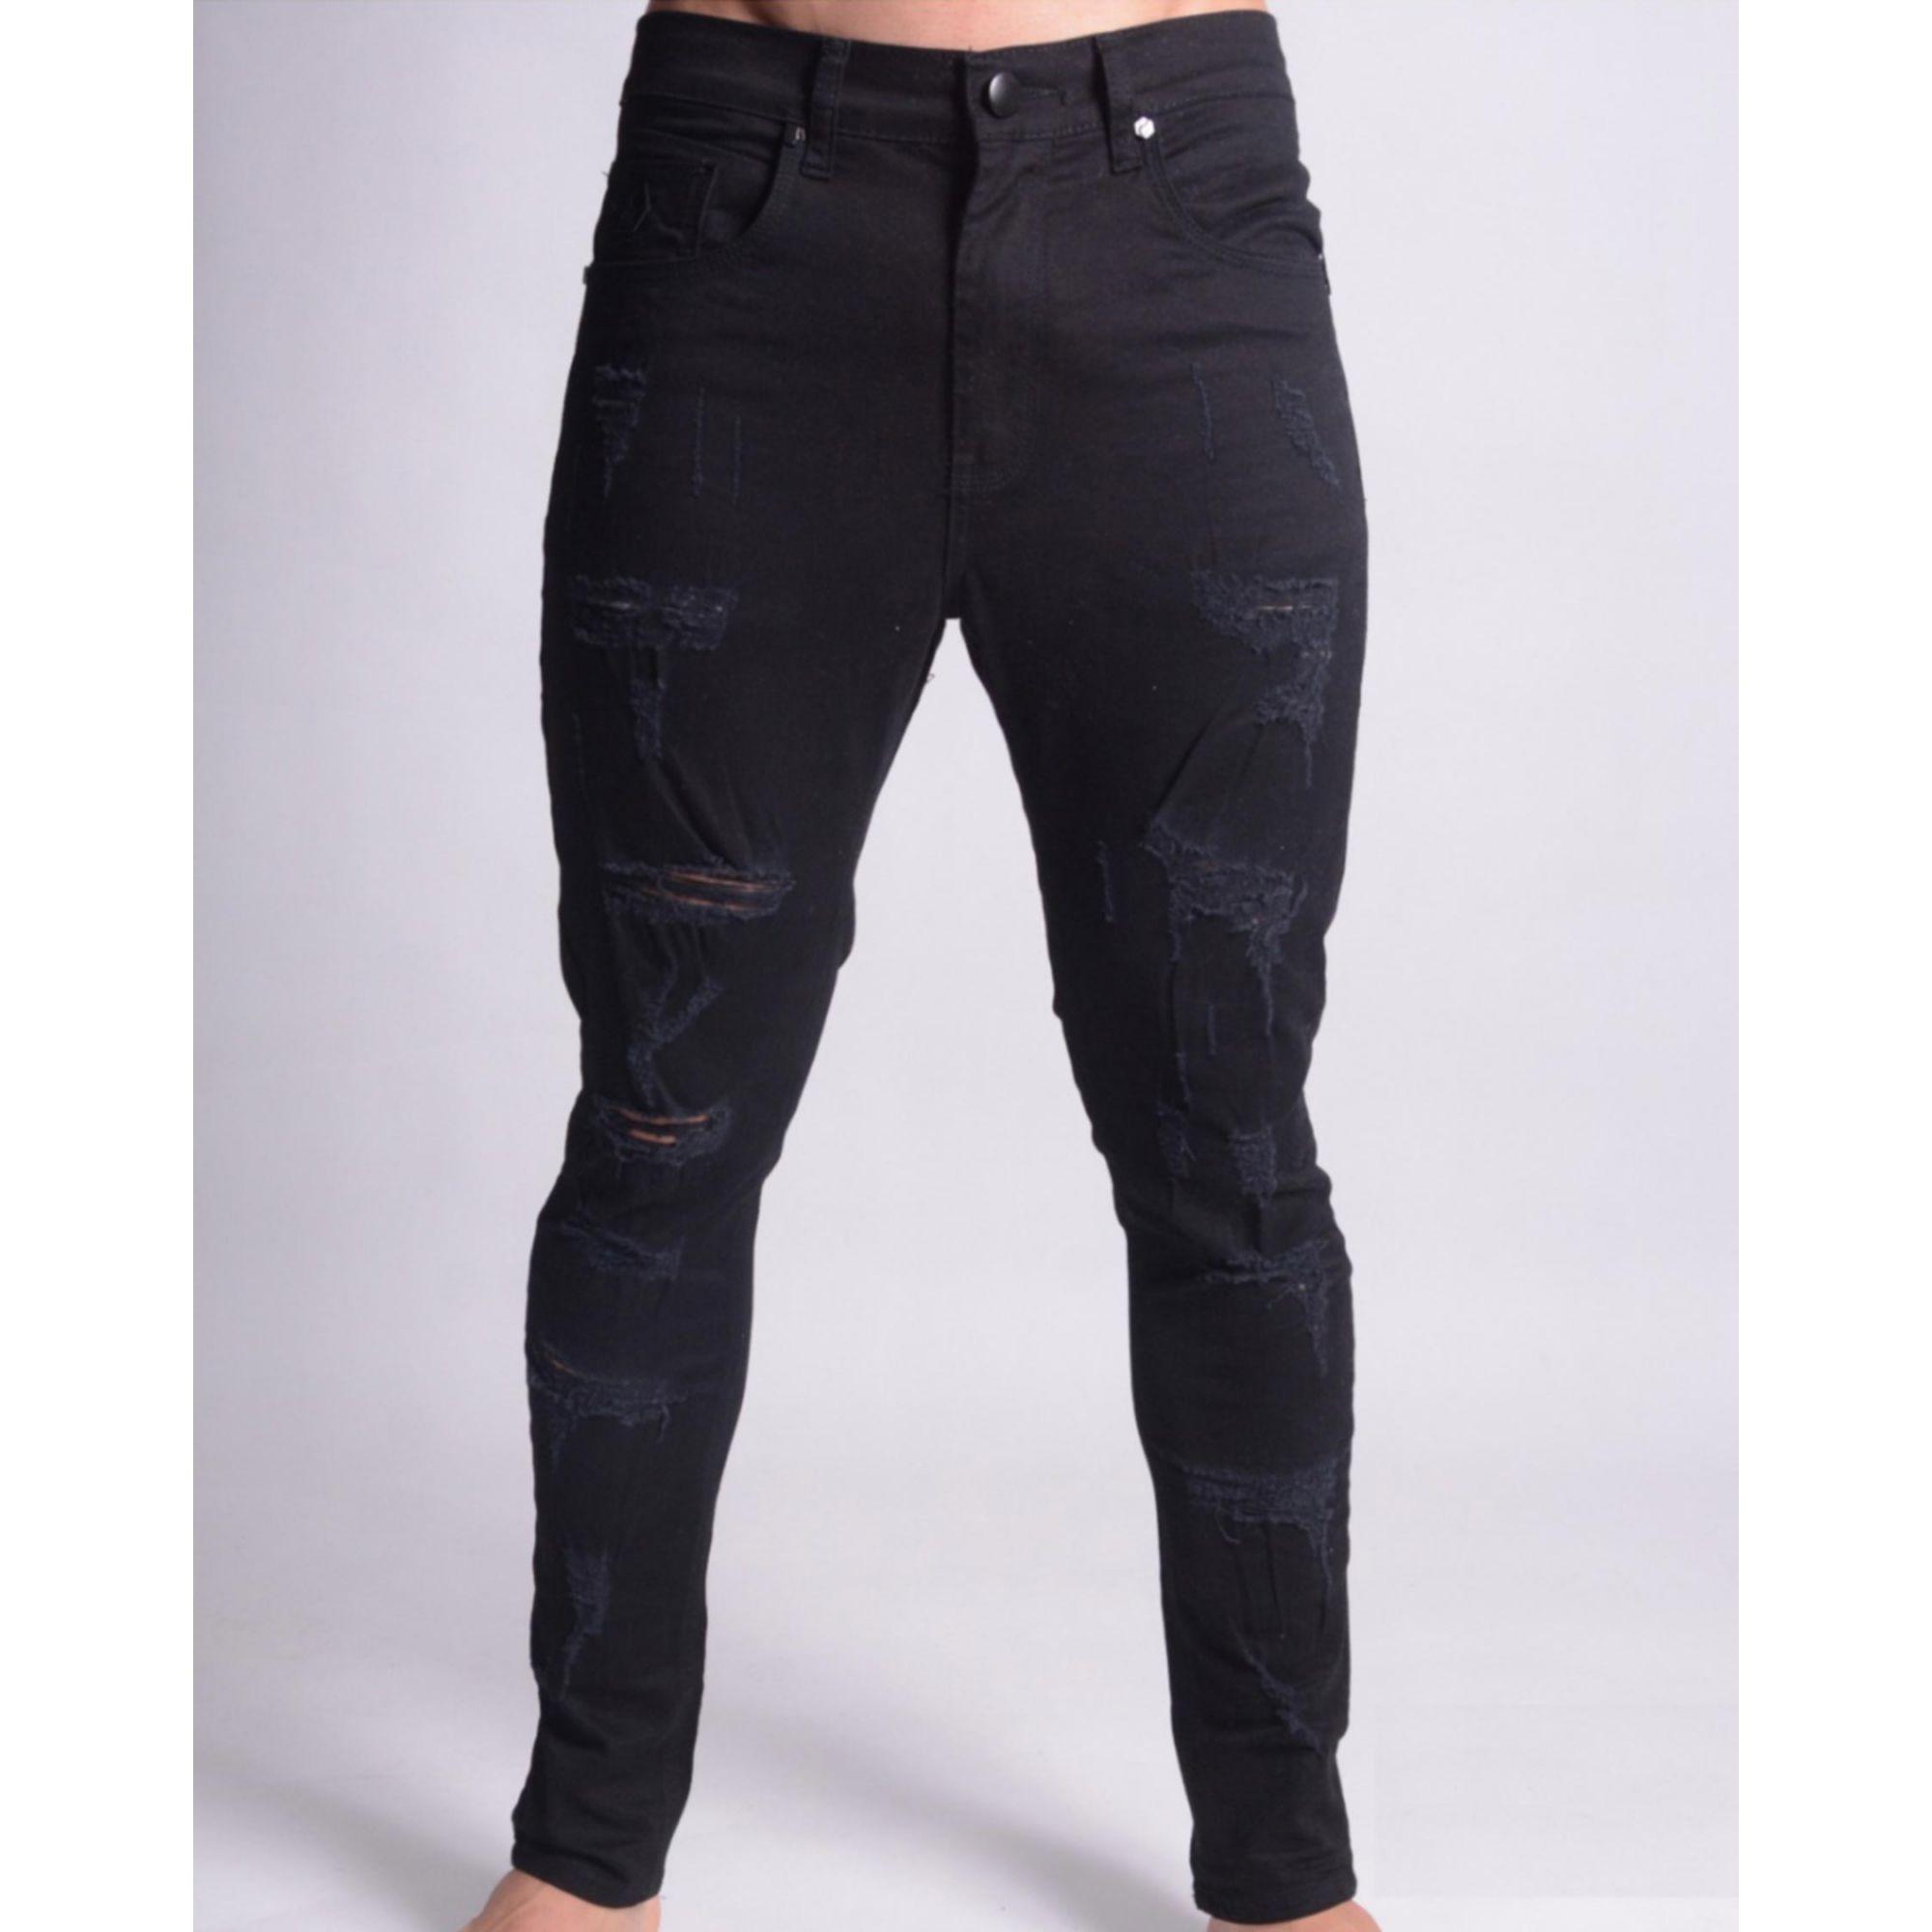 Calça Buh Jeans Black